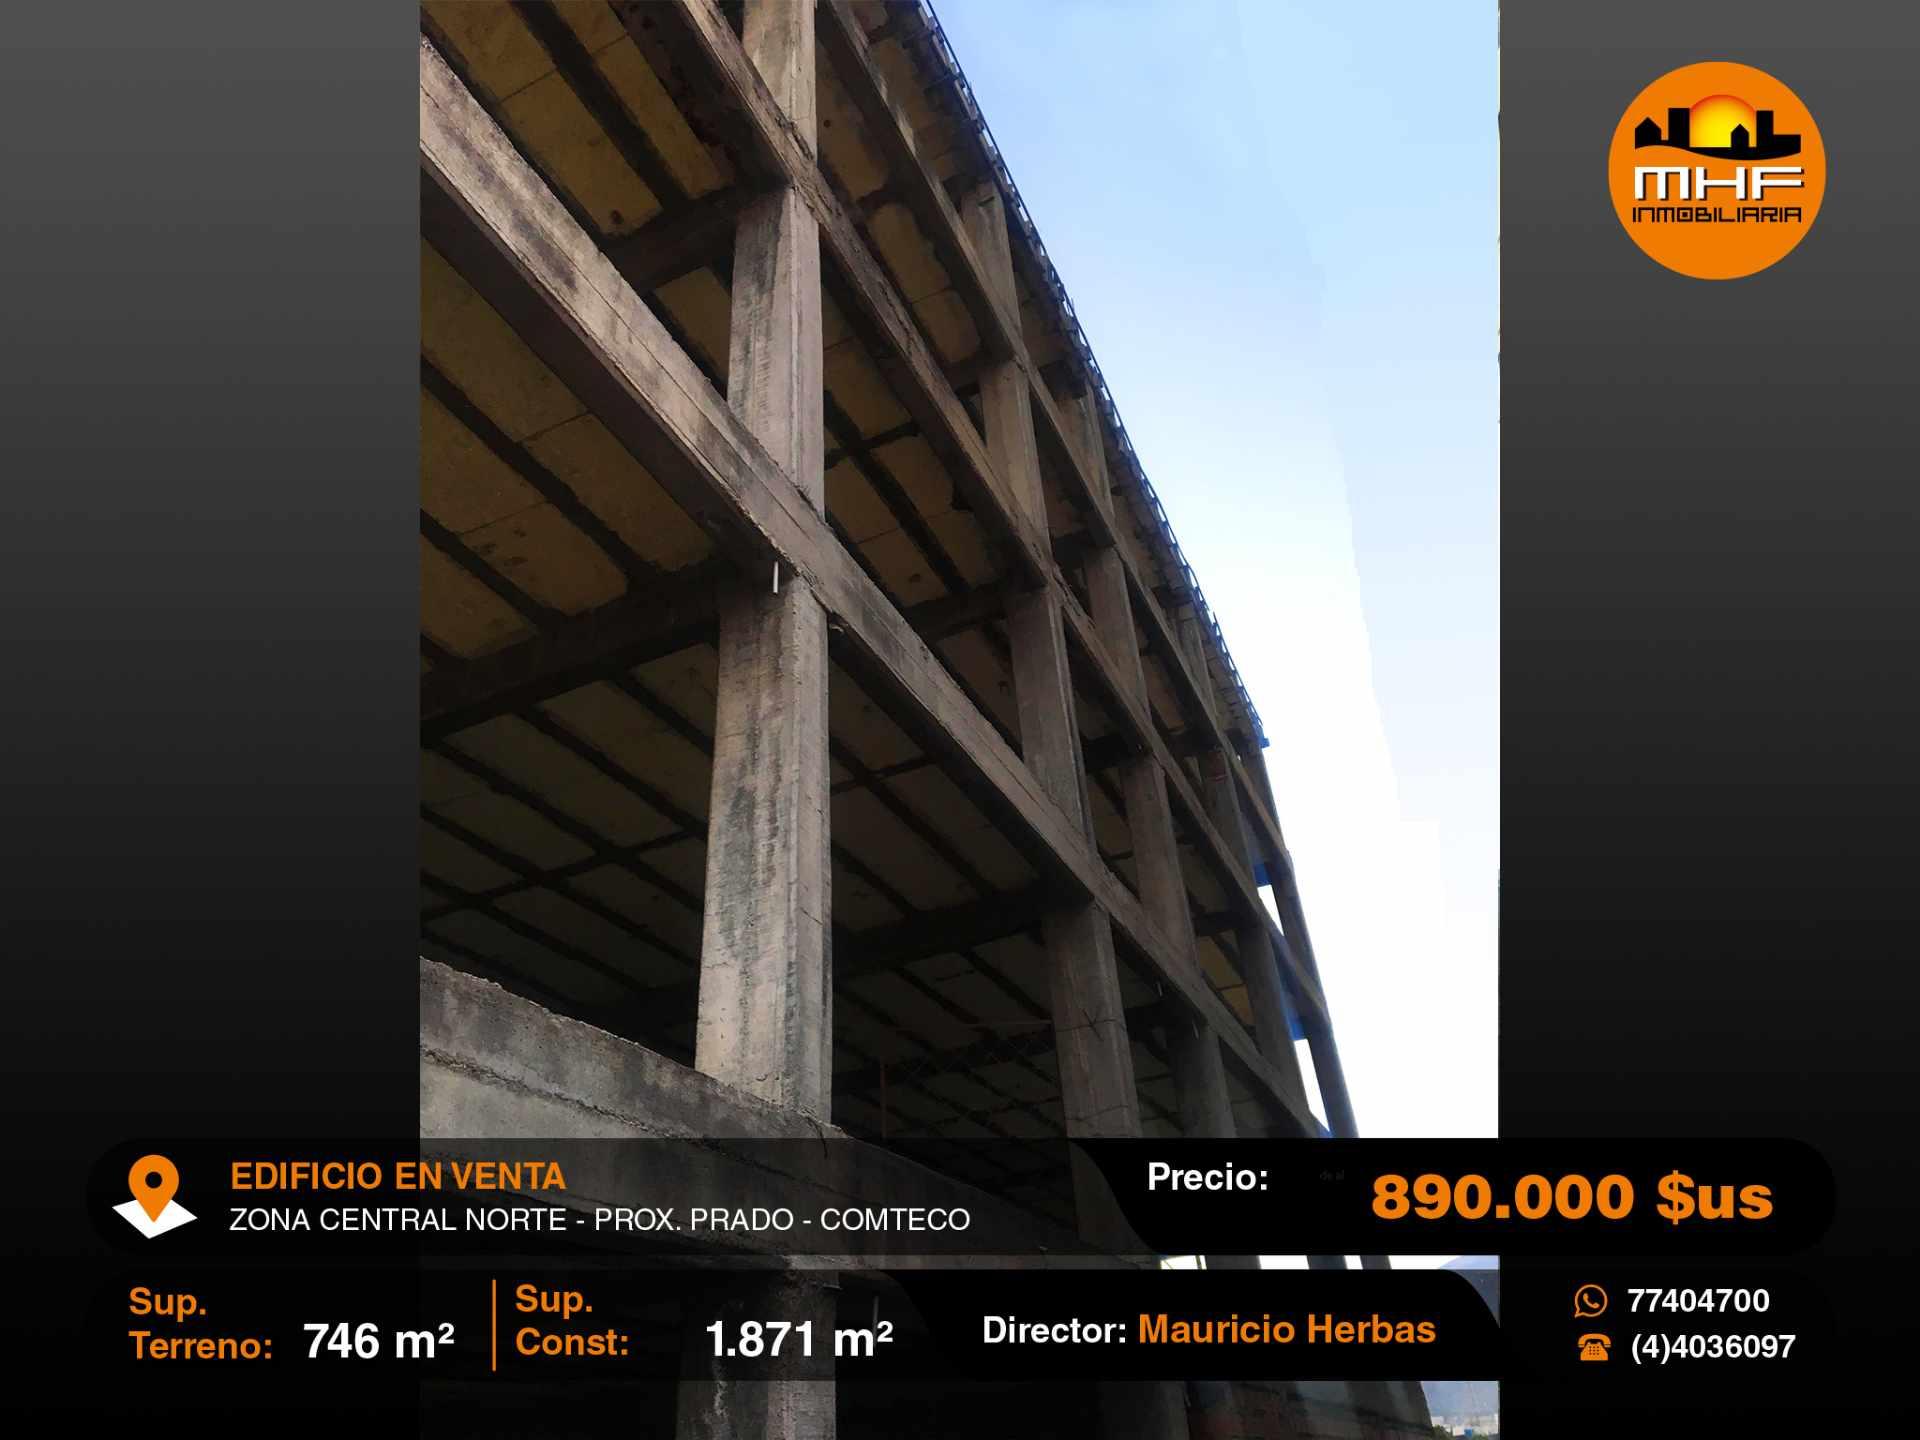 Edificio en Venta PROXIMO PRADO - COMTECO Foto 2